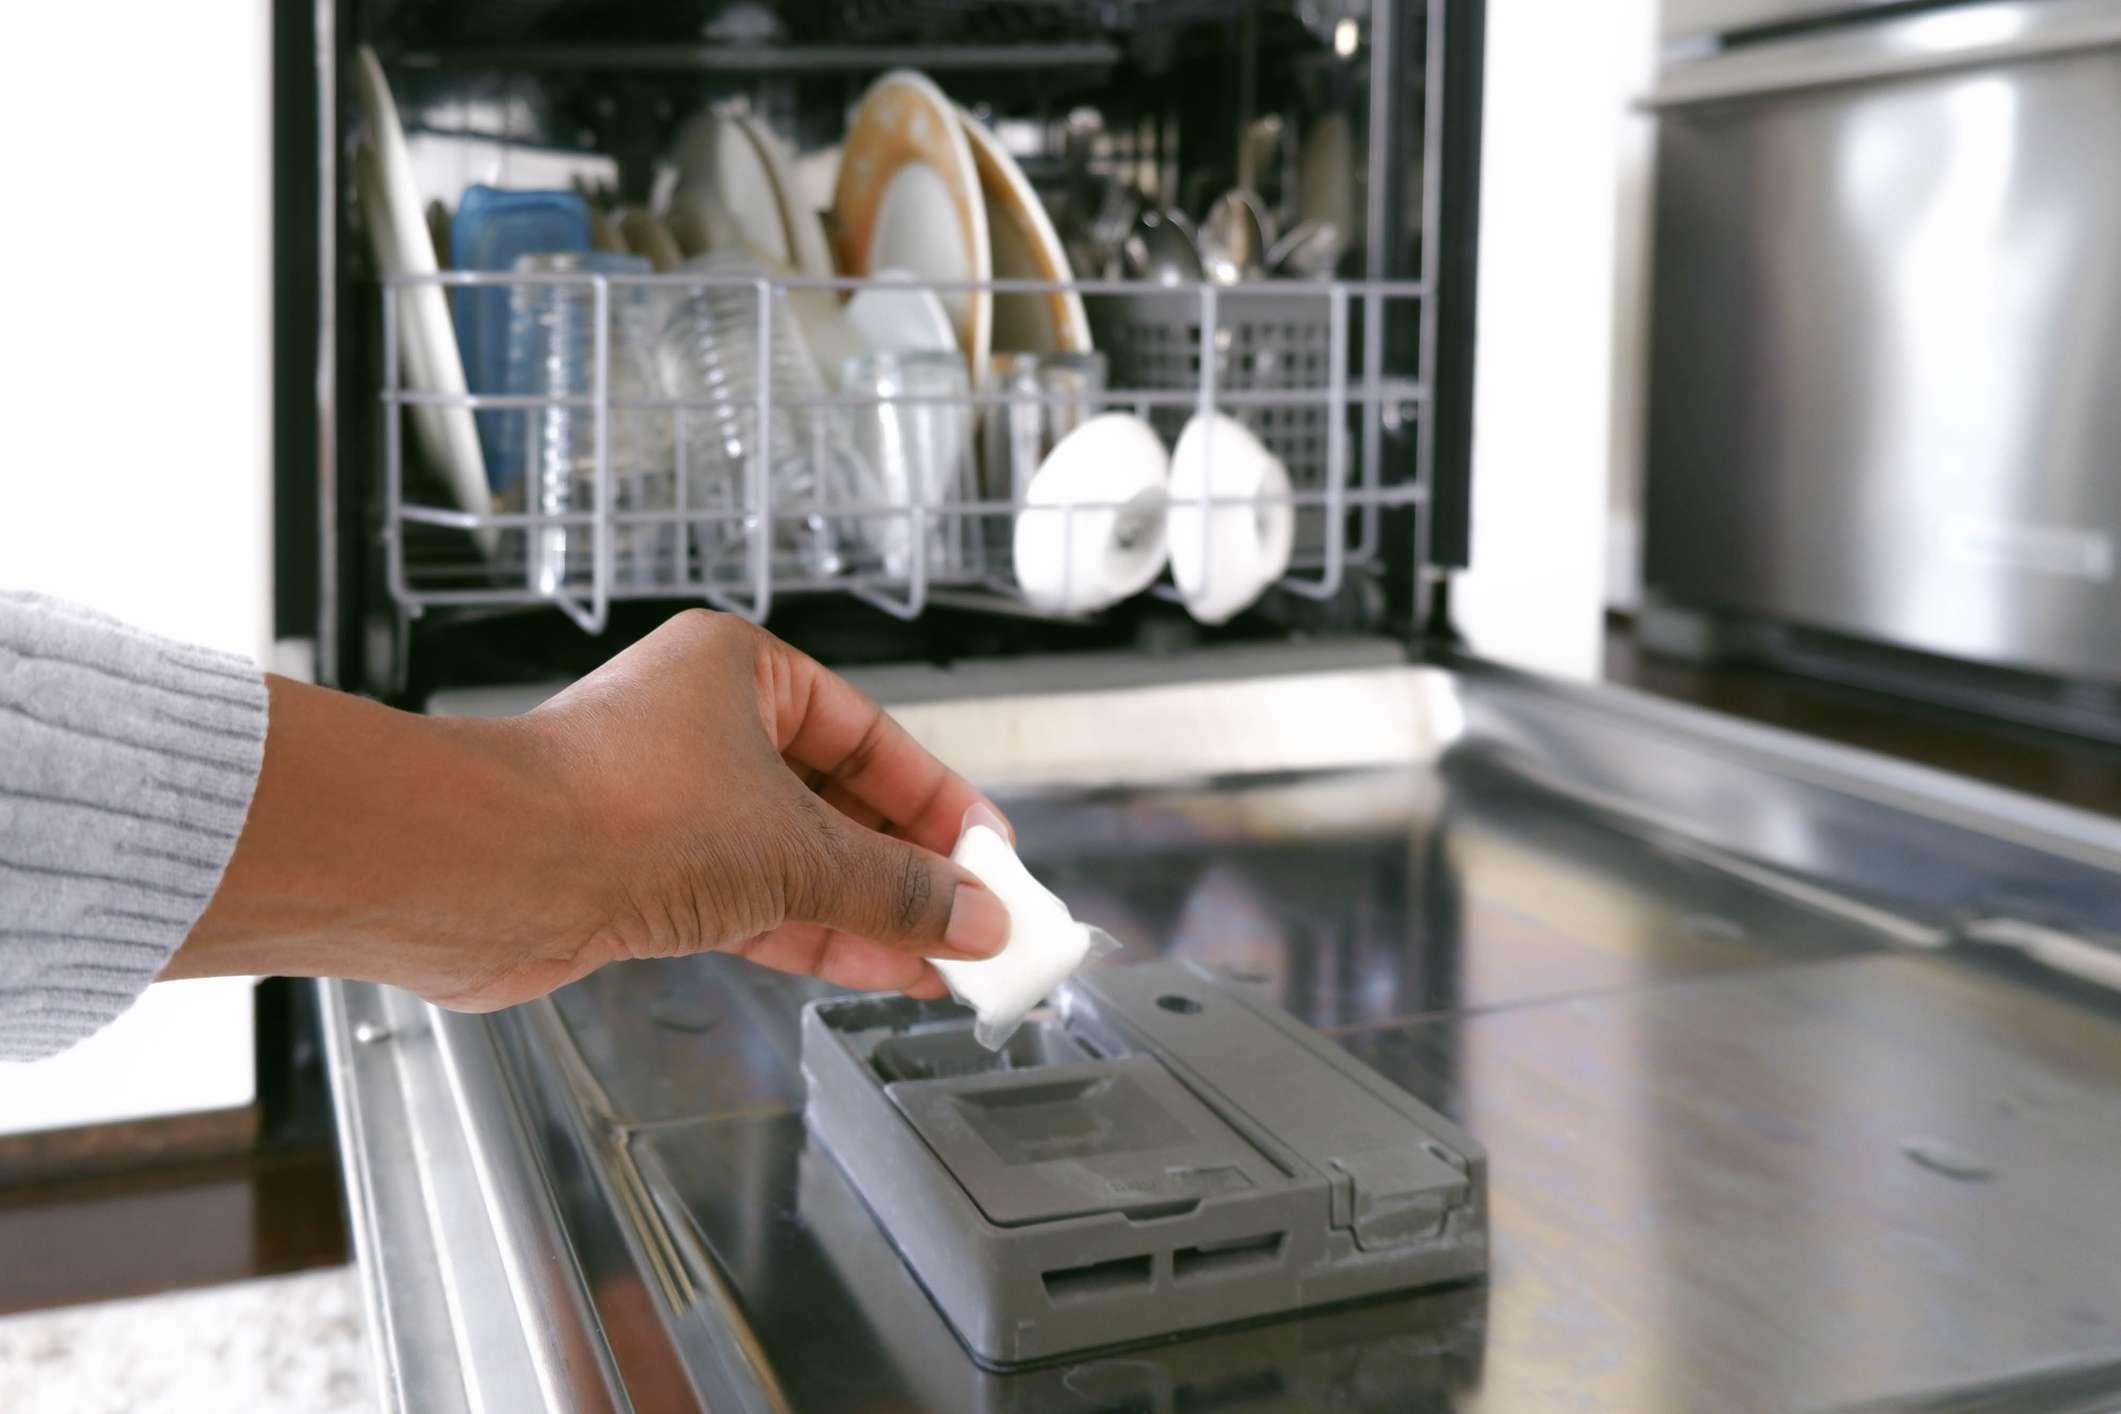 A woman putting a dishwasher pod into a dishwasher